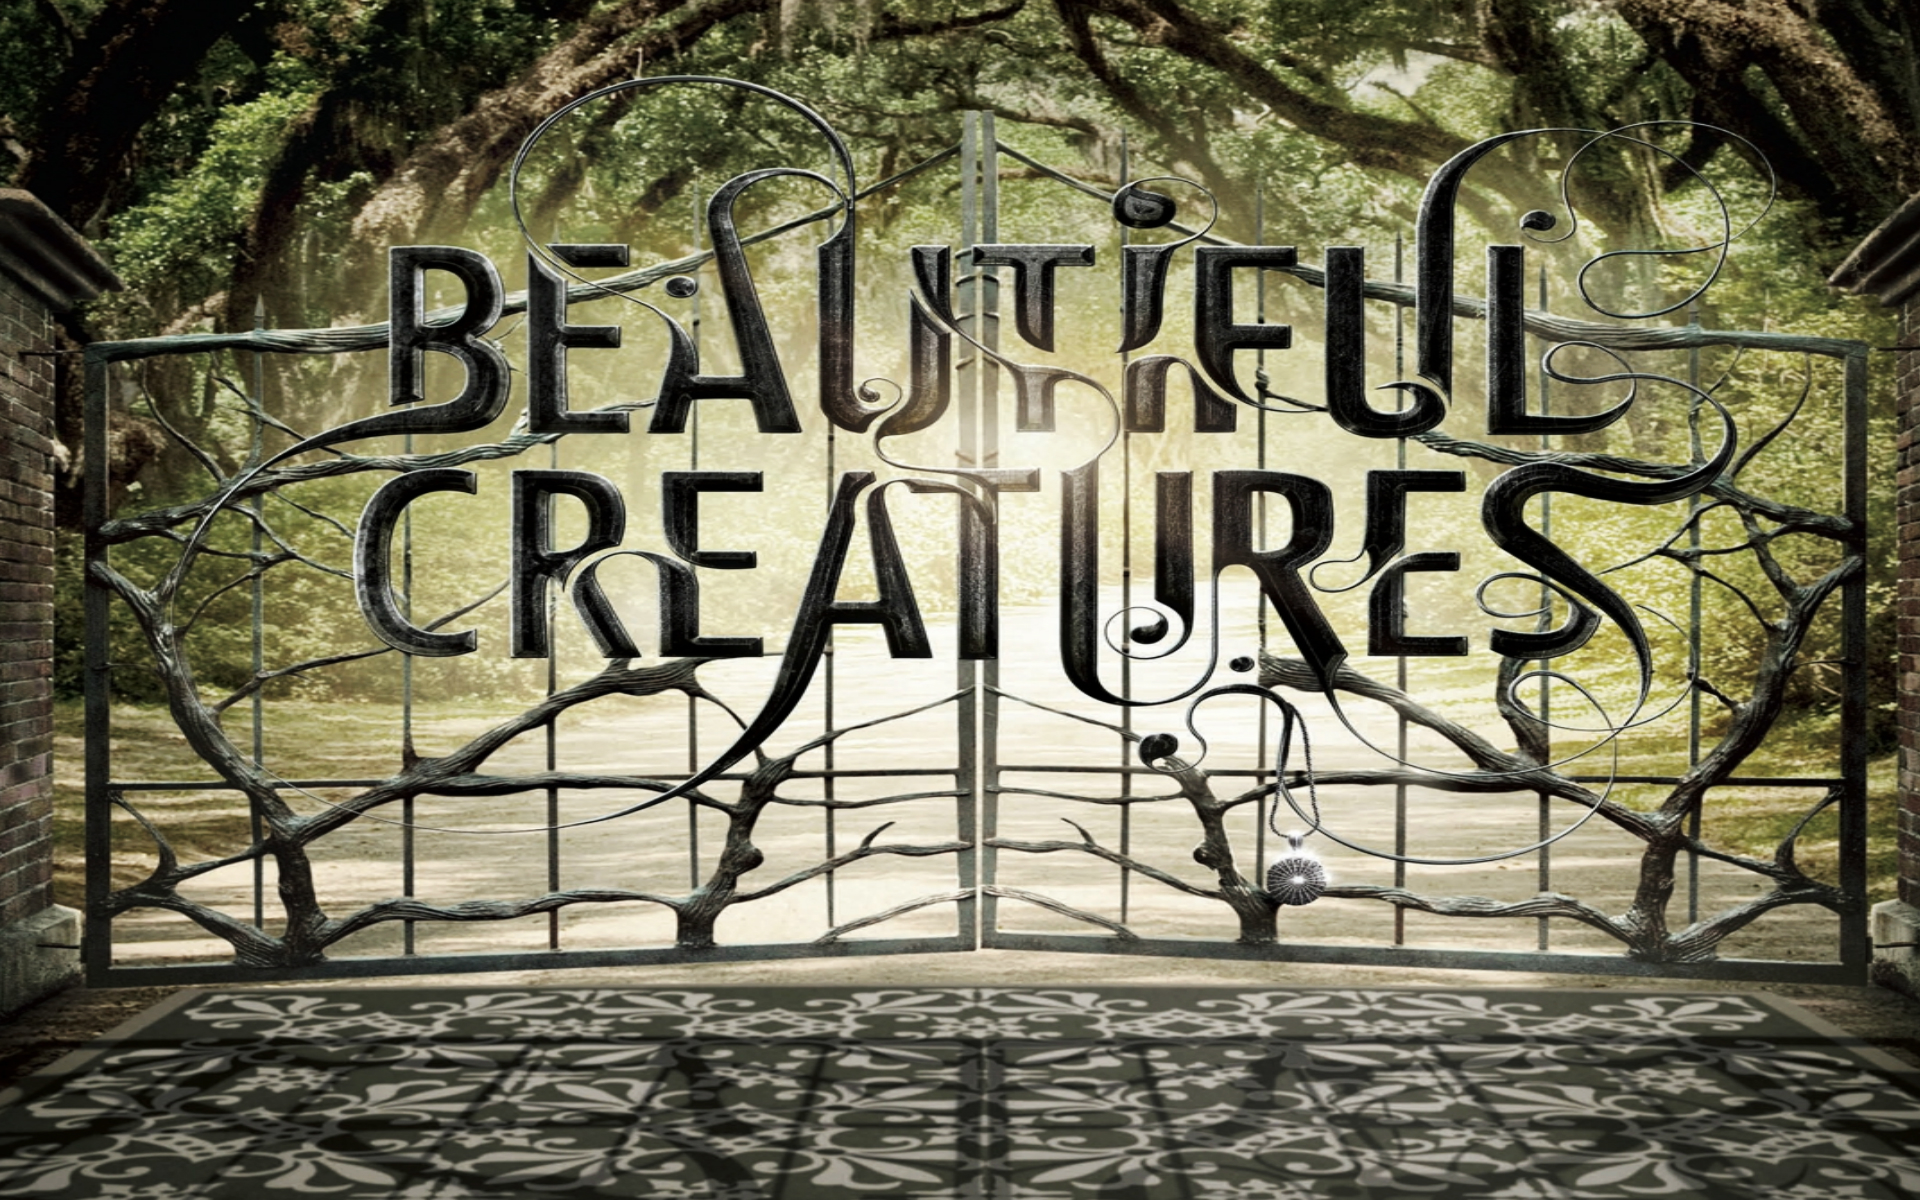 http://2.bp.blogspot.com/-6rQgHPMPDjM/UPLaERLxMgI/AAAAAAAAHAA/W22FB-_EUPY/s2000/Beautiful-Creatures-Typography-HD-Wallpaper_Vvallpaper.Net.jpg